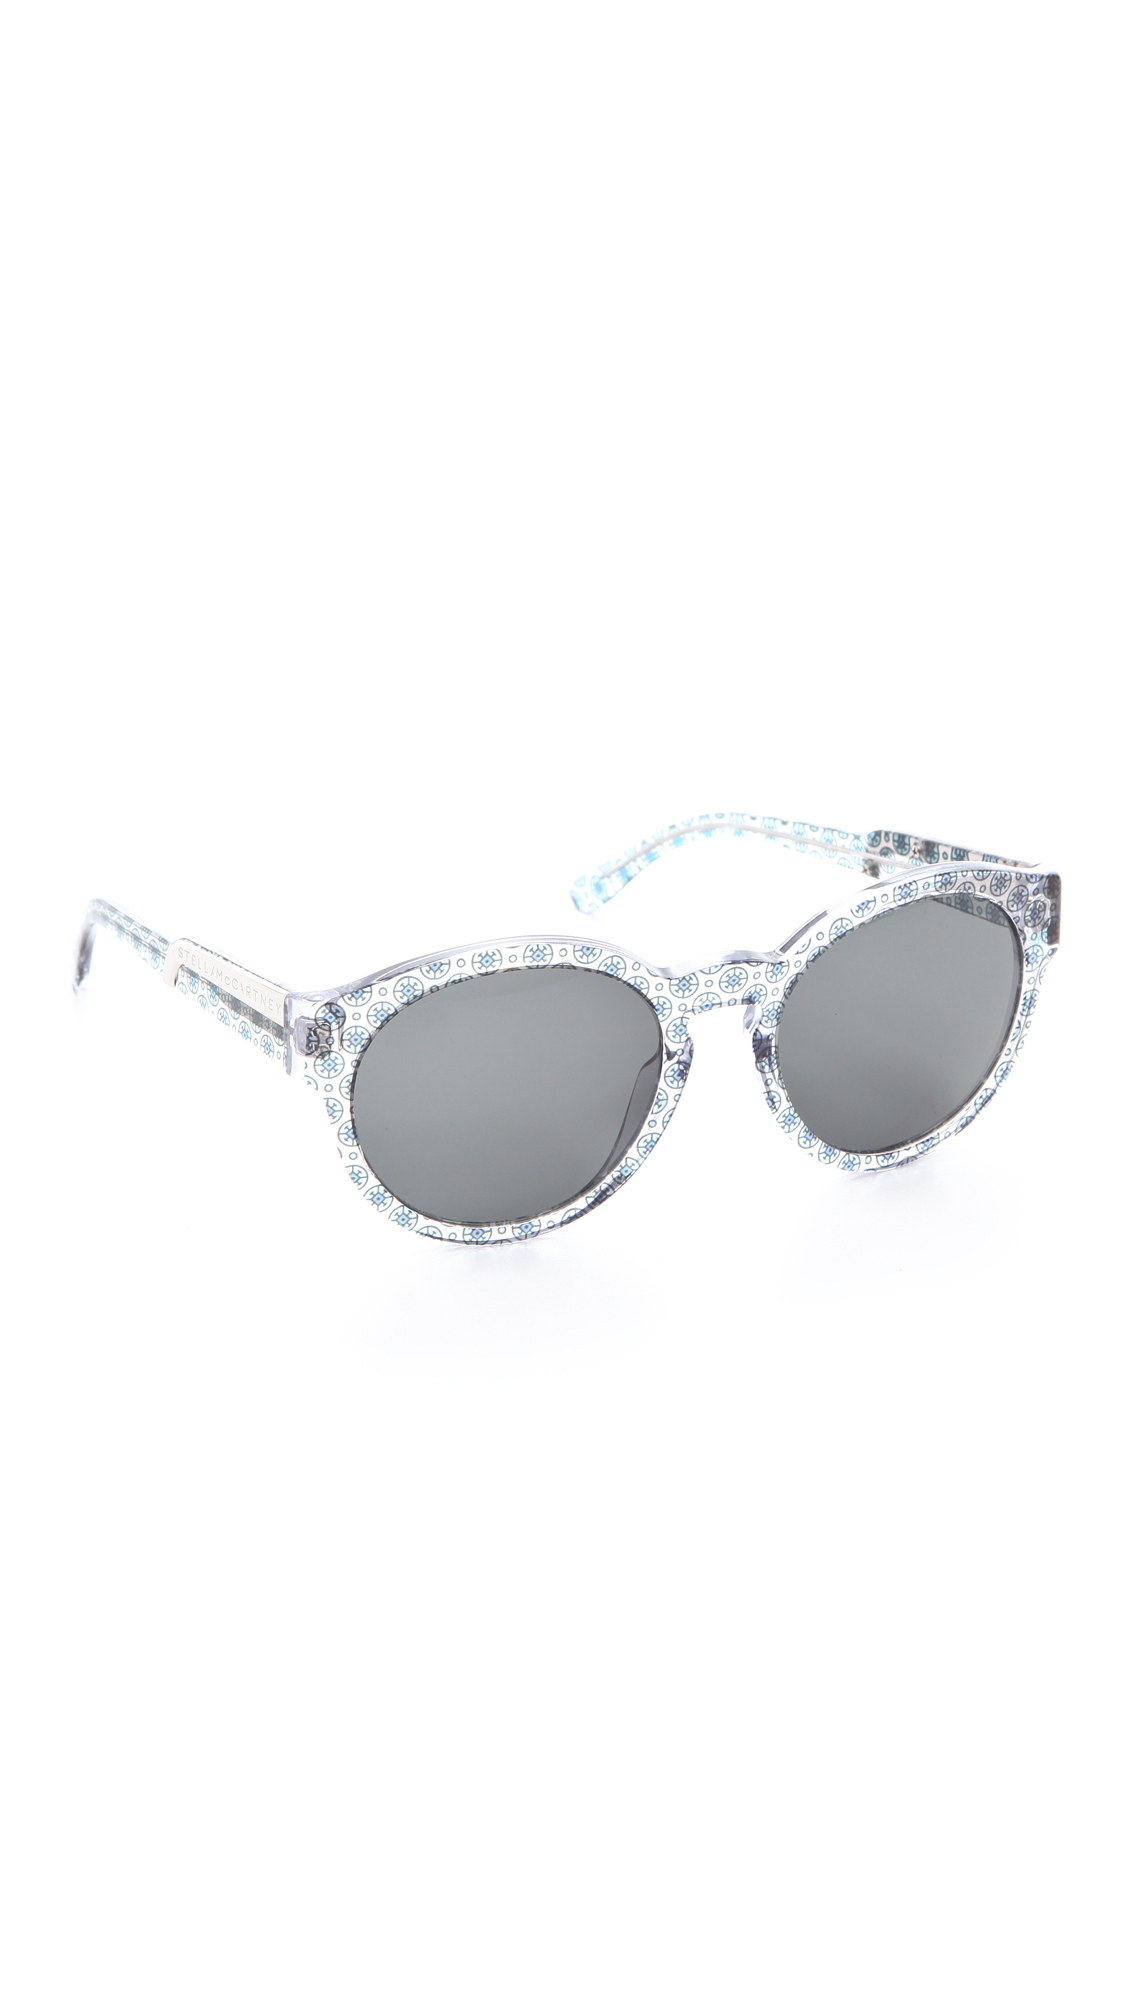 Stella McCartney Round Sunglasses Oriental Circle Red in Grey